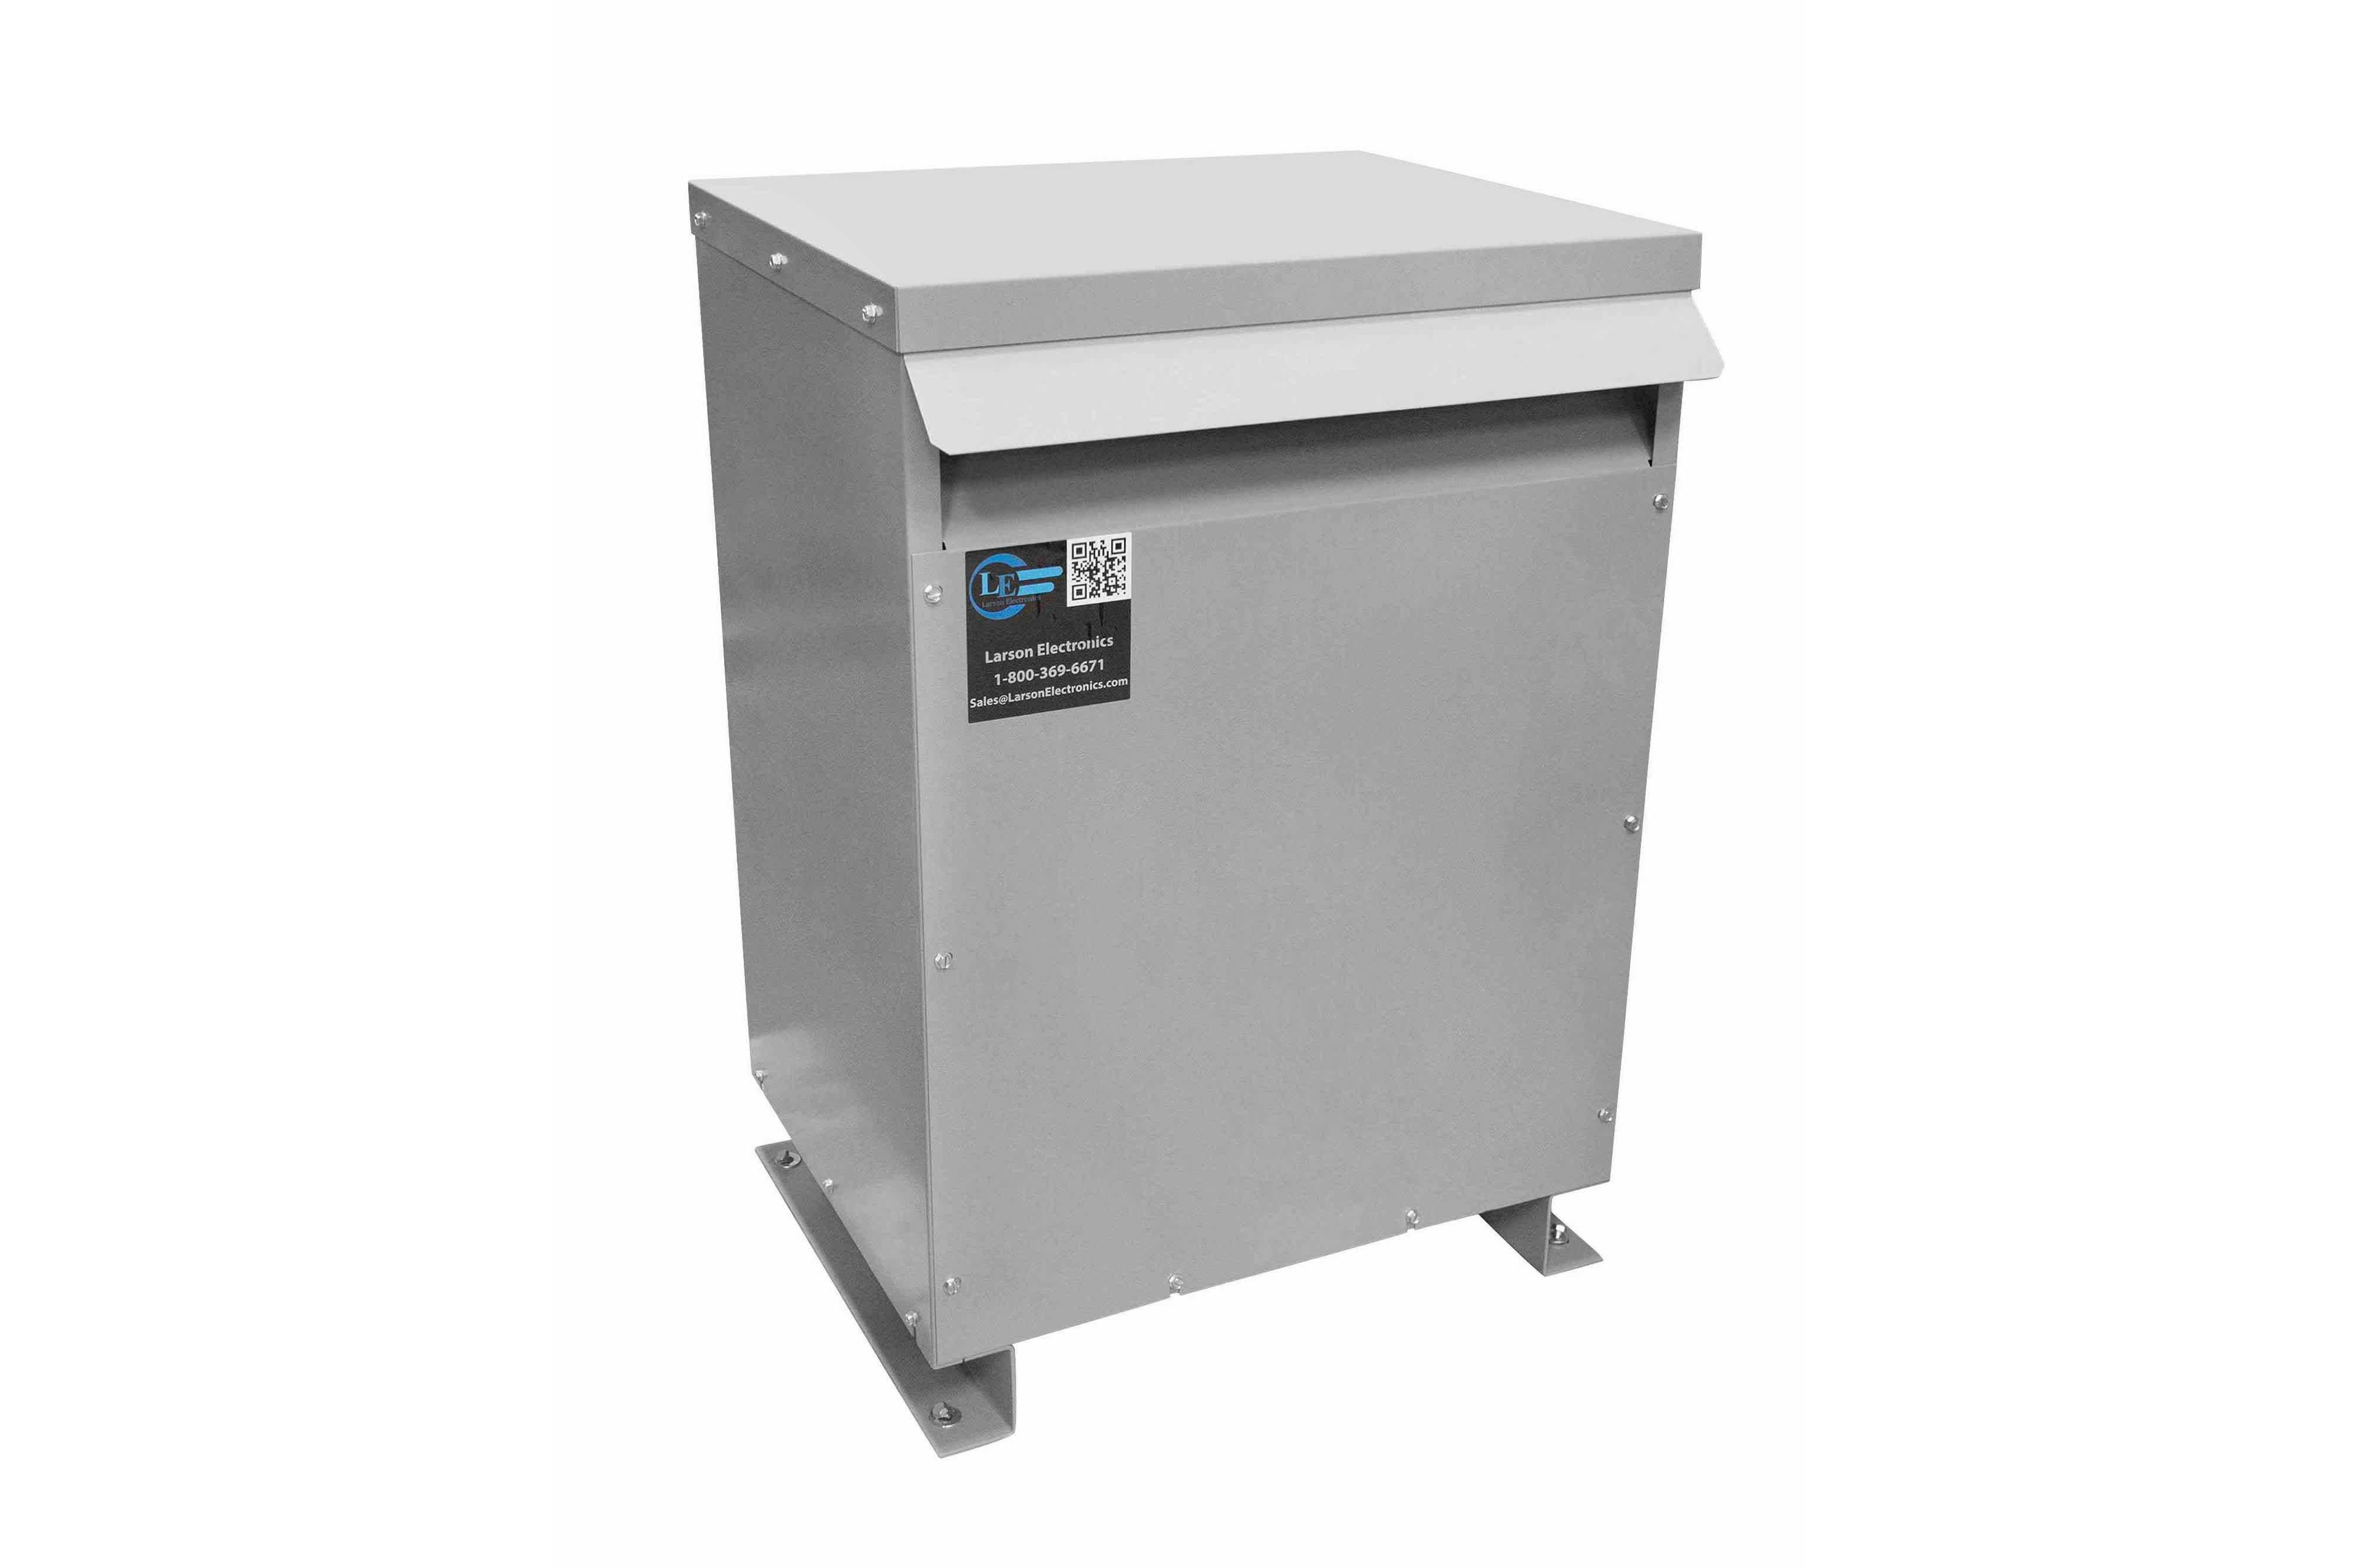 250 kVA 3PH Isolation Transformer, 460V Wye Primary, 415V Delta Secondary, N3R, Ventilated, 60 Hz